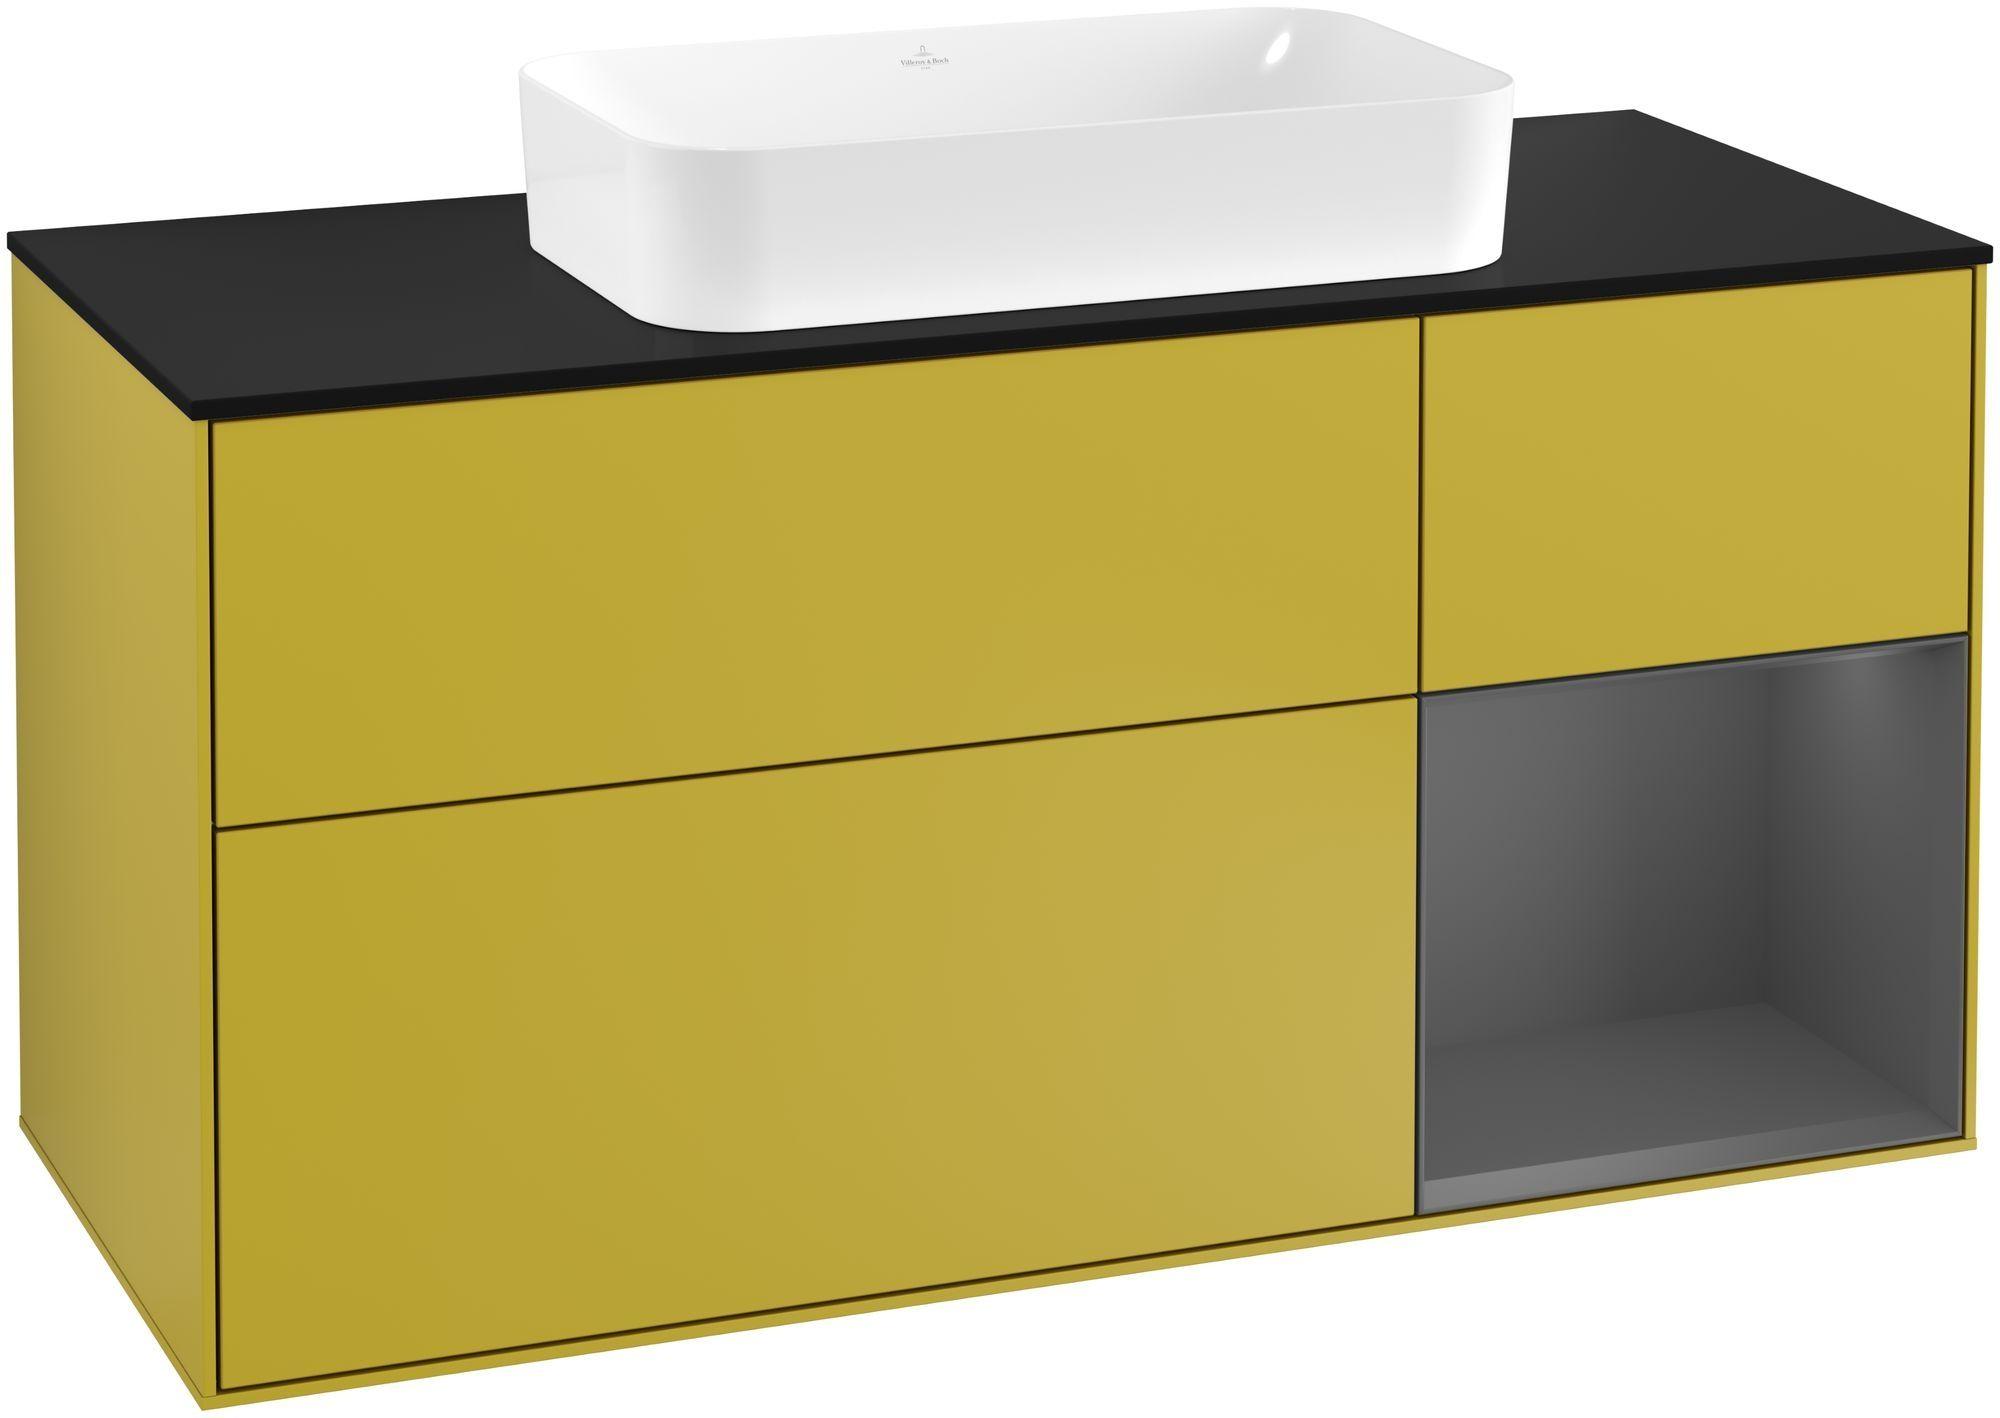 Villeroy & Boch Finion F30 Waschtischunterschrank mit Regalelement 3 Auszüge Waschtisch mittig LED-Beleuchtung B:120xH:60,3xT:50,1cm Front, Korpus: Sun, Regal: Anthracite Matt, Glasplatte: Black Matt F302GKHE